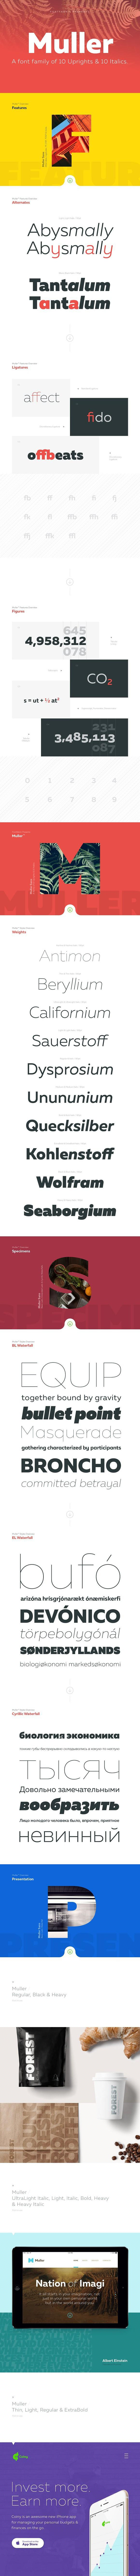 Muller Family - 20 fonts. Sans Serif Fonts. $279.00